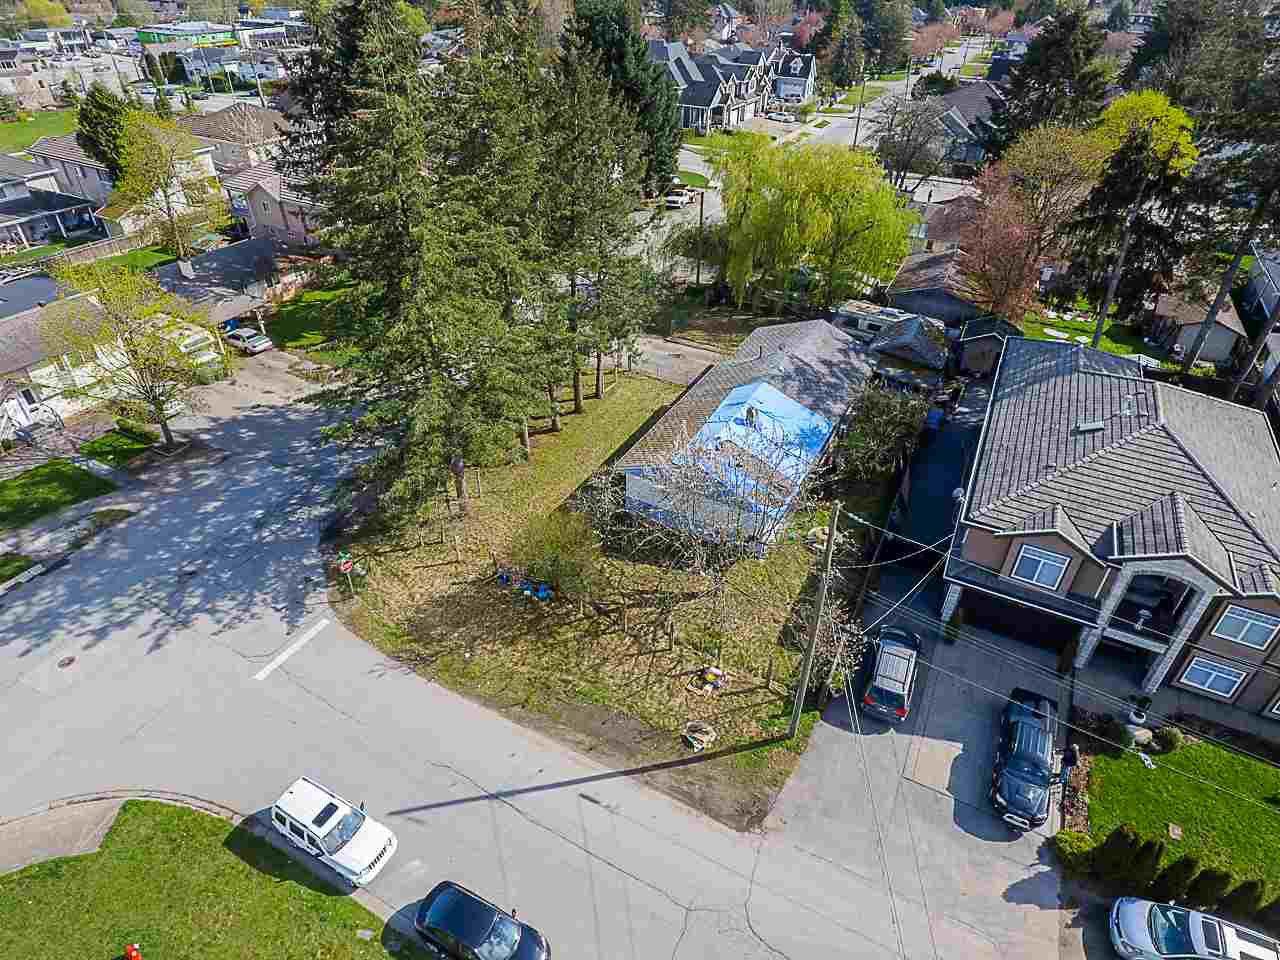 Main Photo: 6843 135 Street in Surrey: West Newton Land for sale : MLS®# R2358551